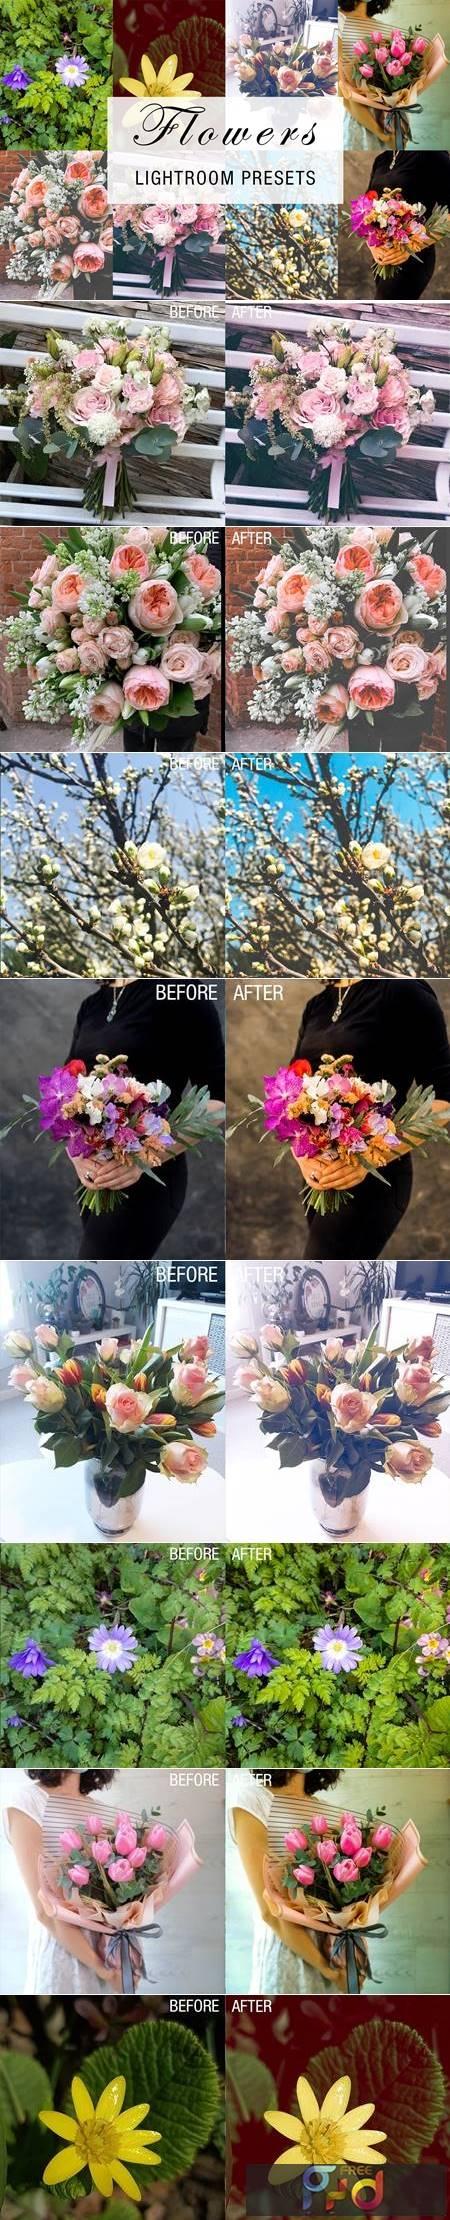 24 flowers lightroom presets 4784961 1